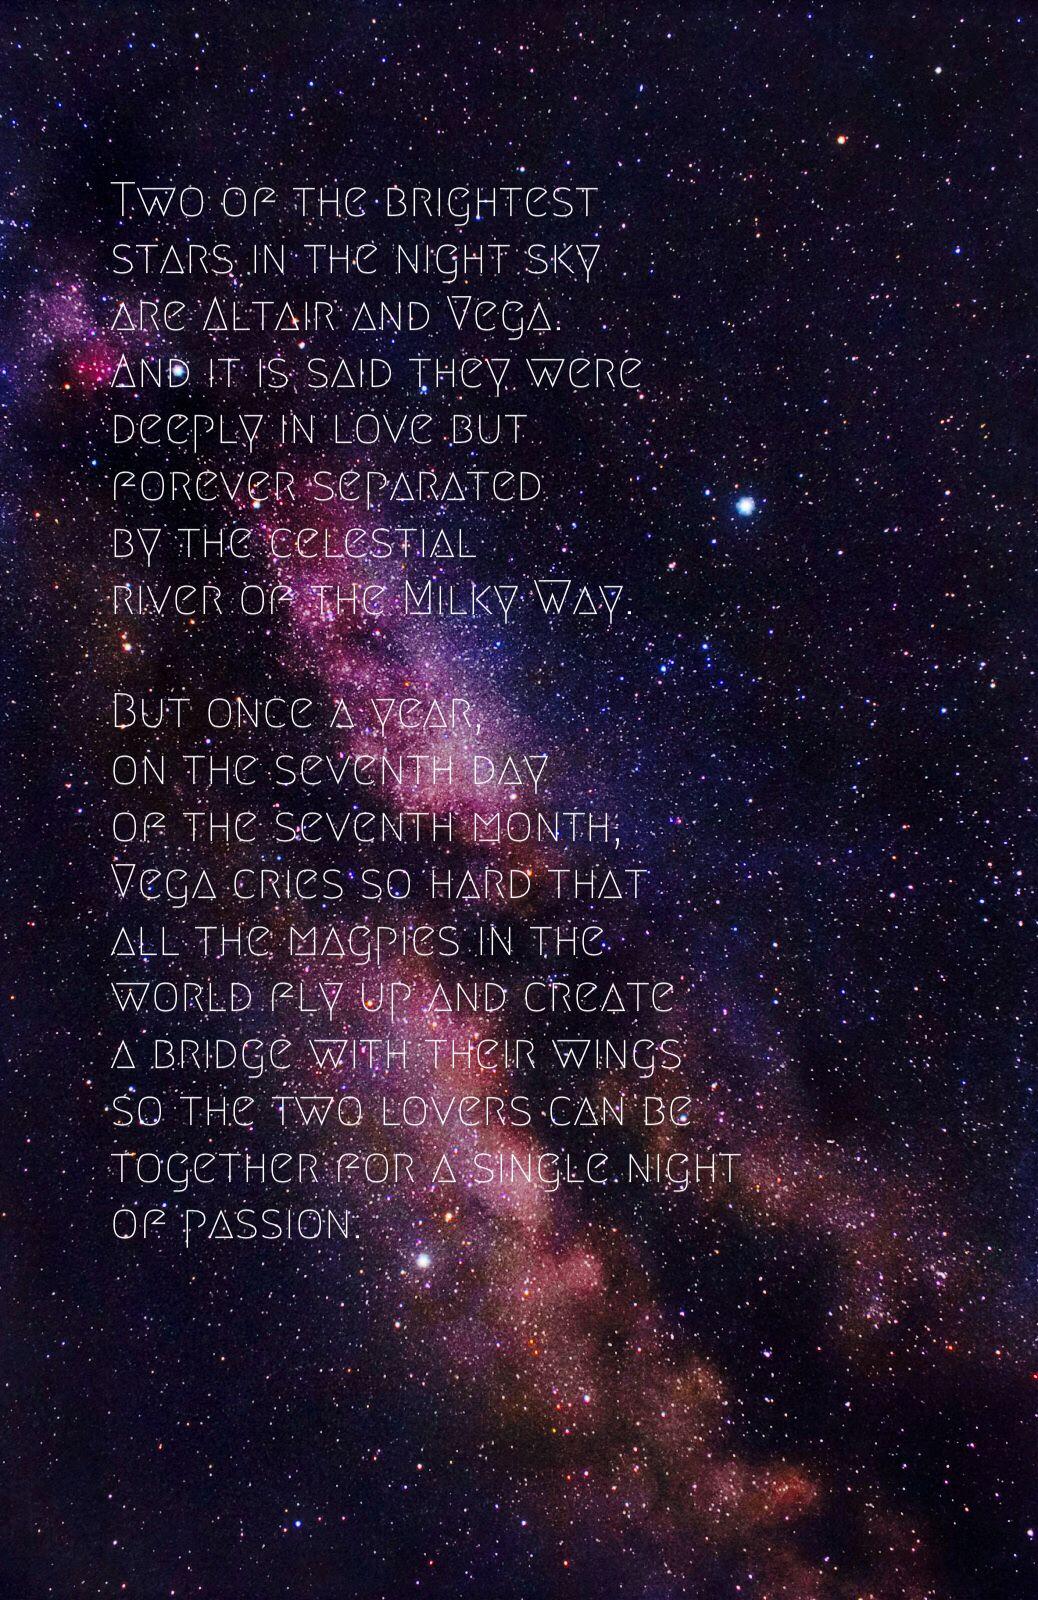 Altair And Vega Long Lost Lovers Star Crossed Love Deeply Vega